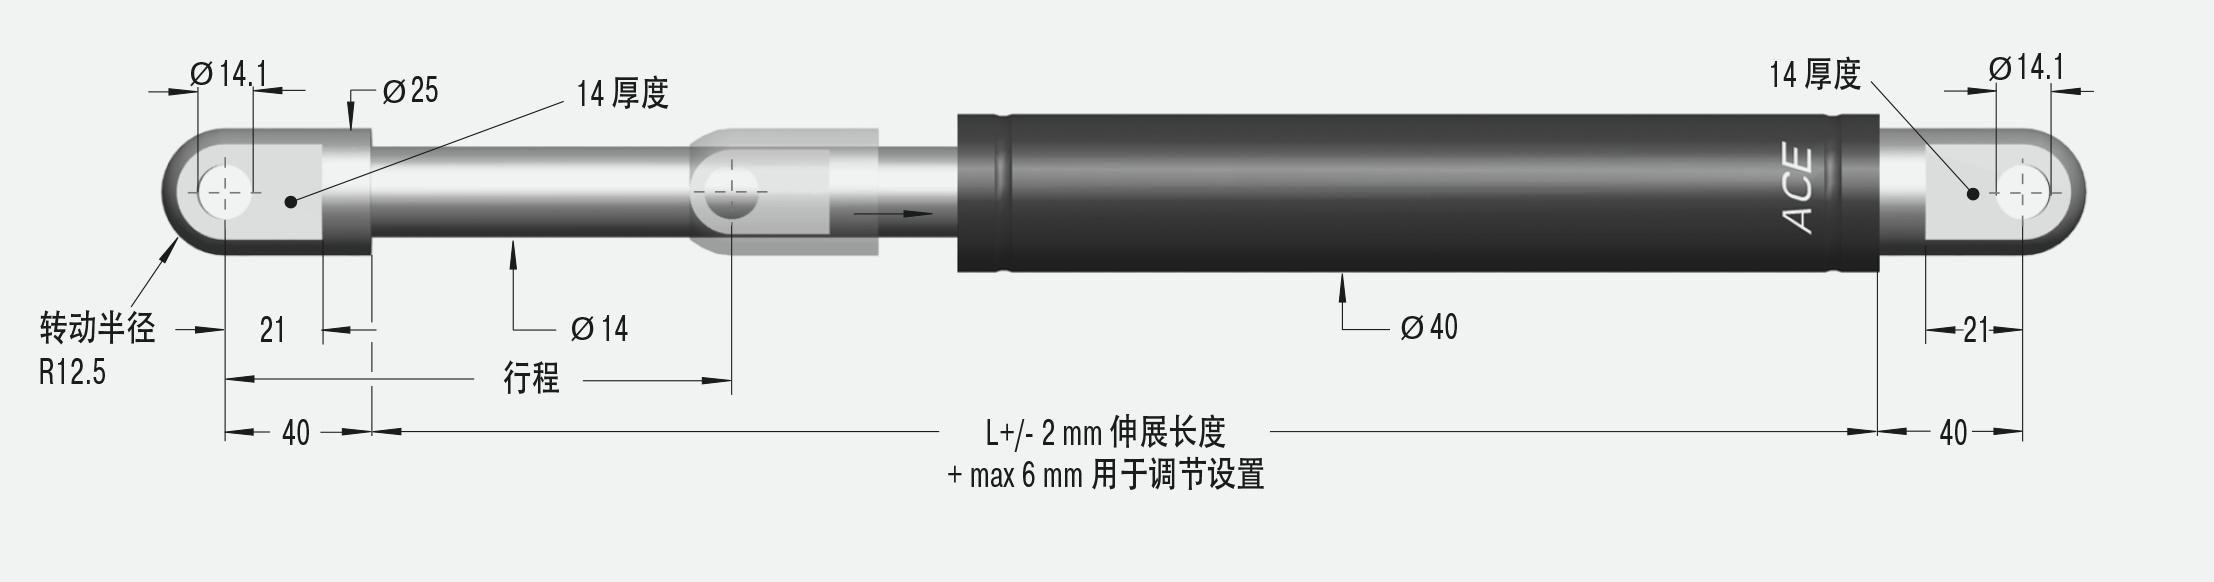 HB-40-400